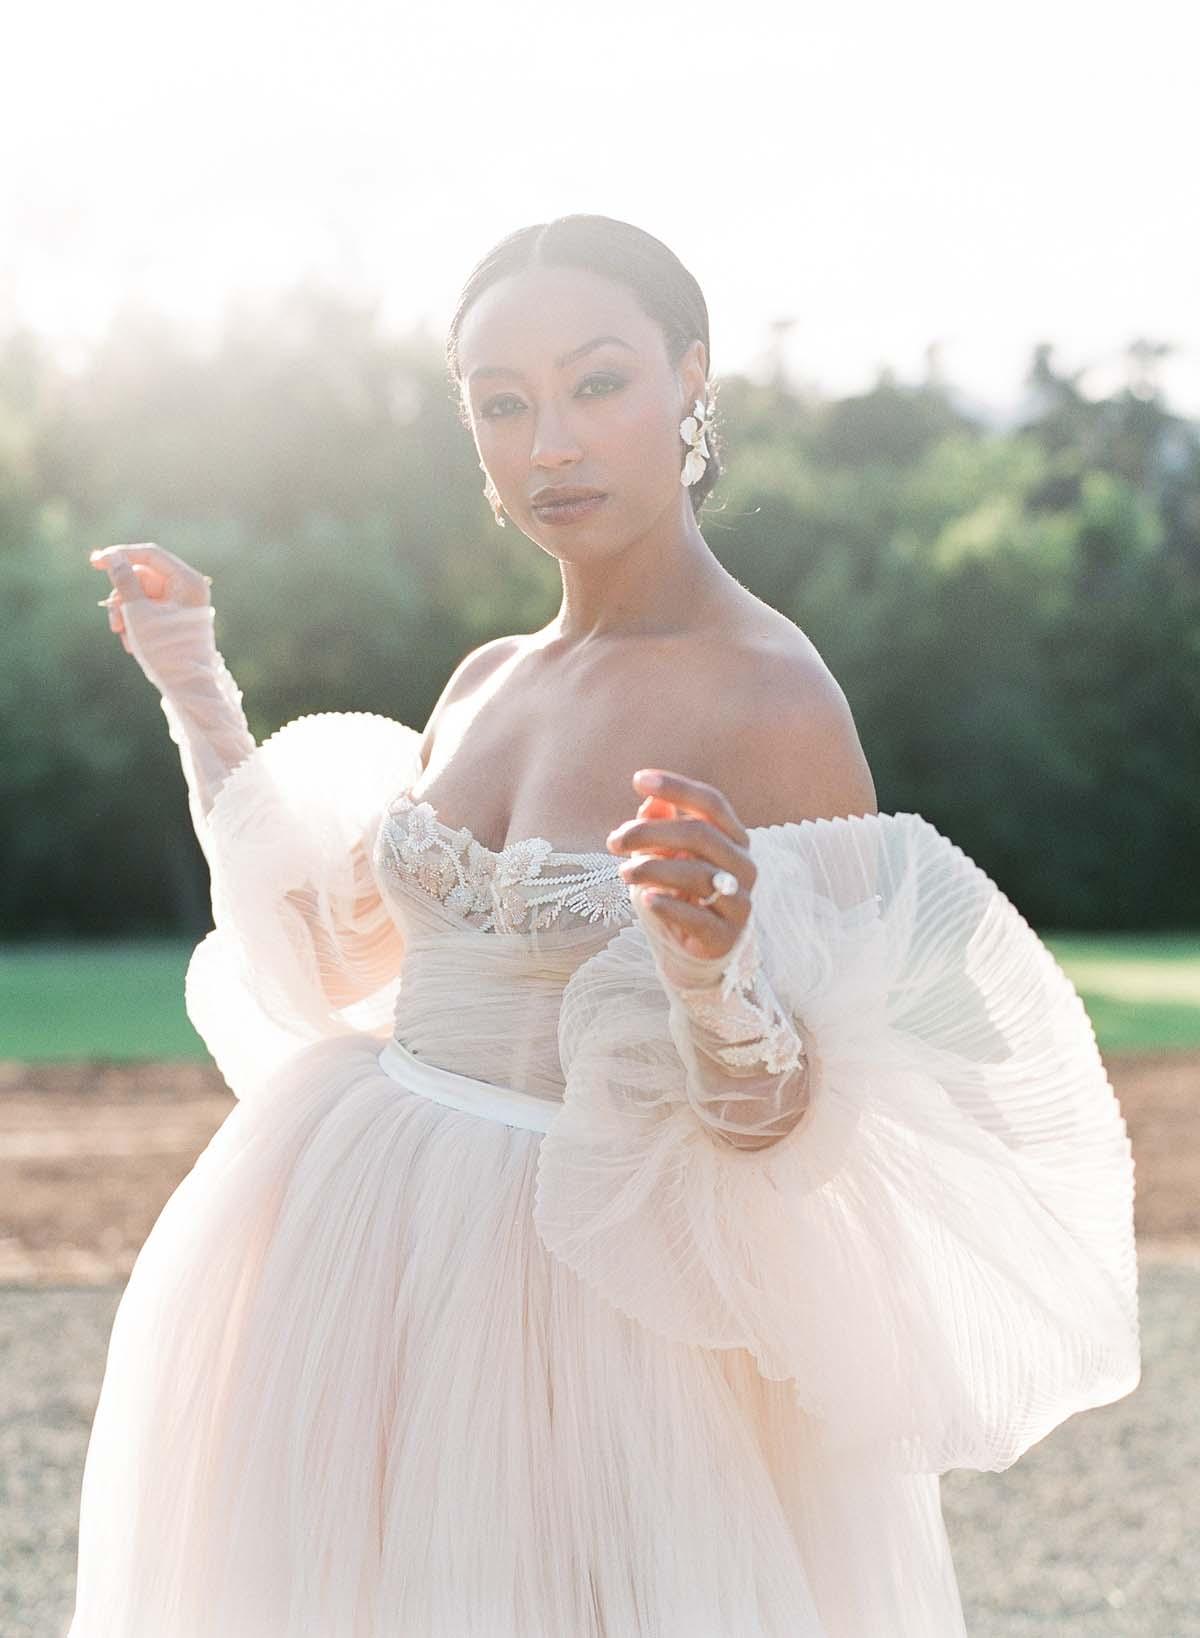 XOXO_BRIDE_Events-Michelle-Beller_Photography_0112